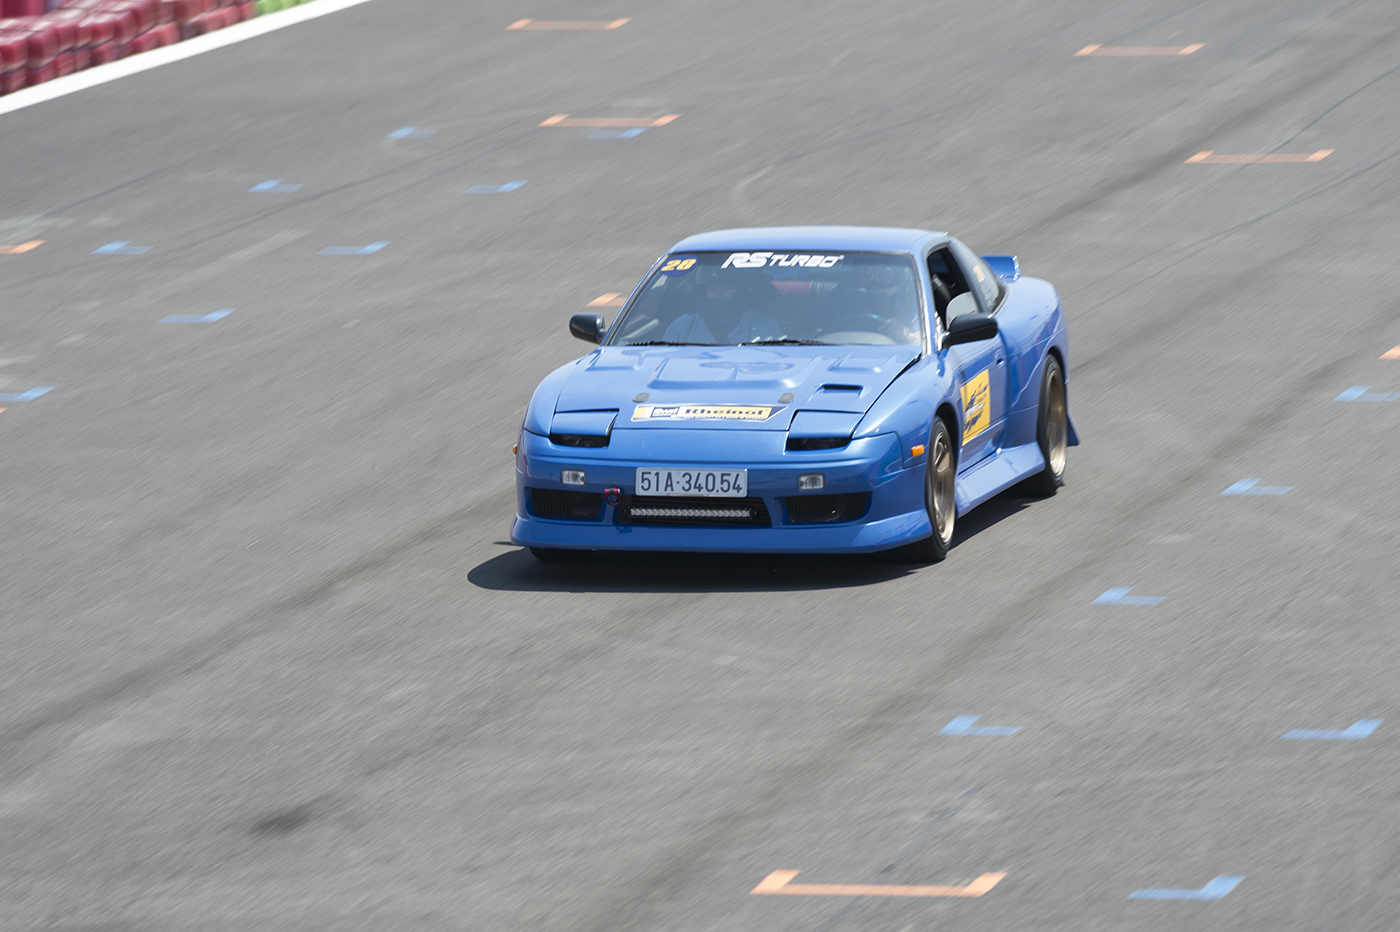 rheinol-racing-days-autodaily-0-21.jpg